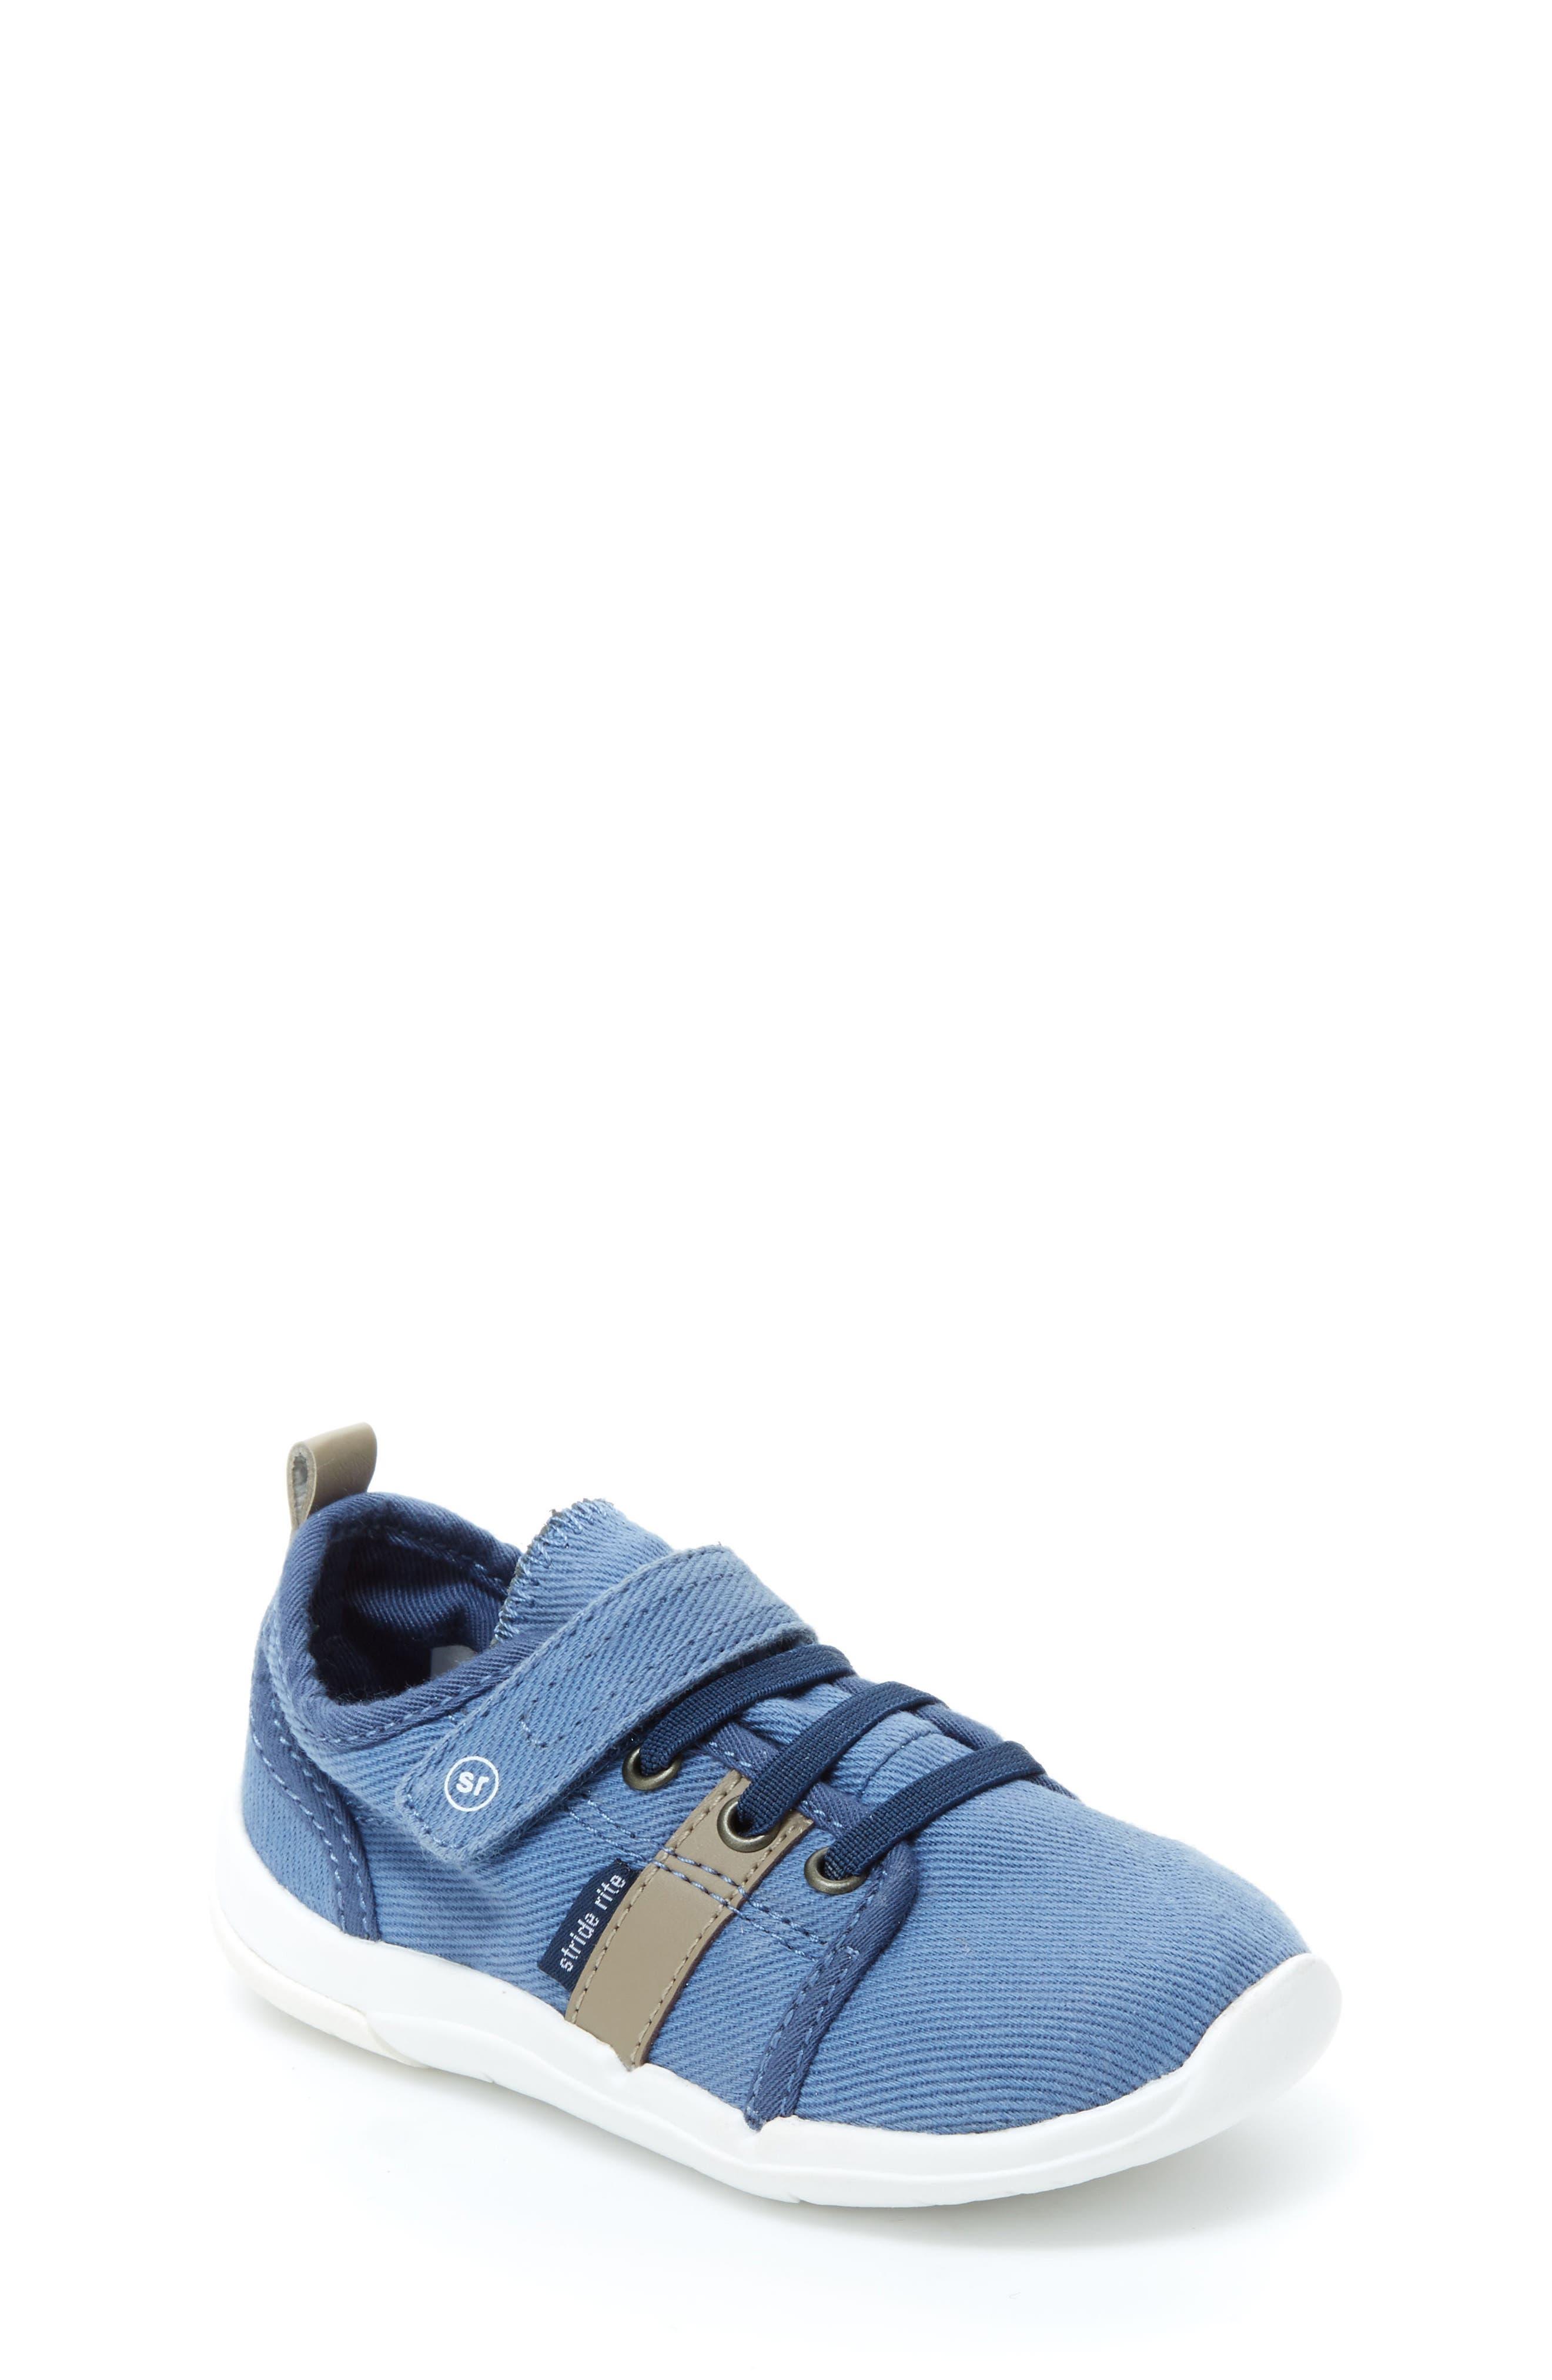 Dixon Sneaker,                             Main thumbnail 1, color,                             400